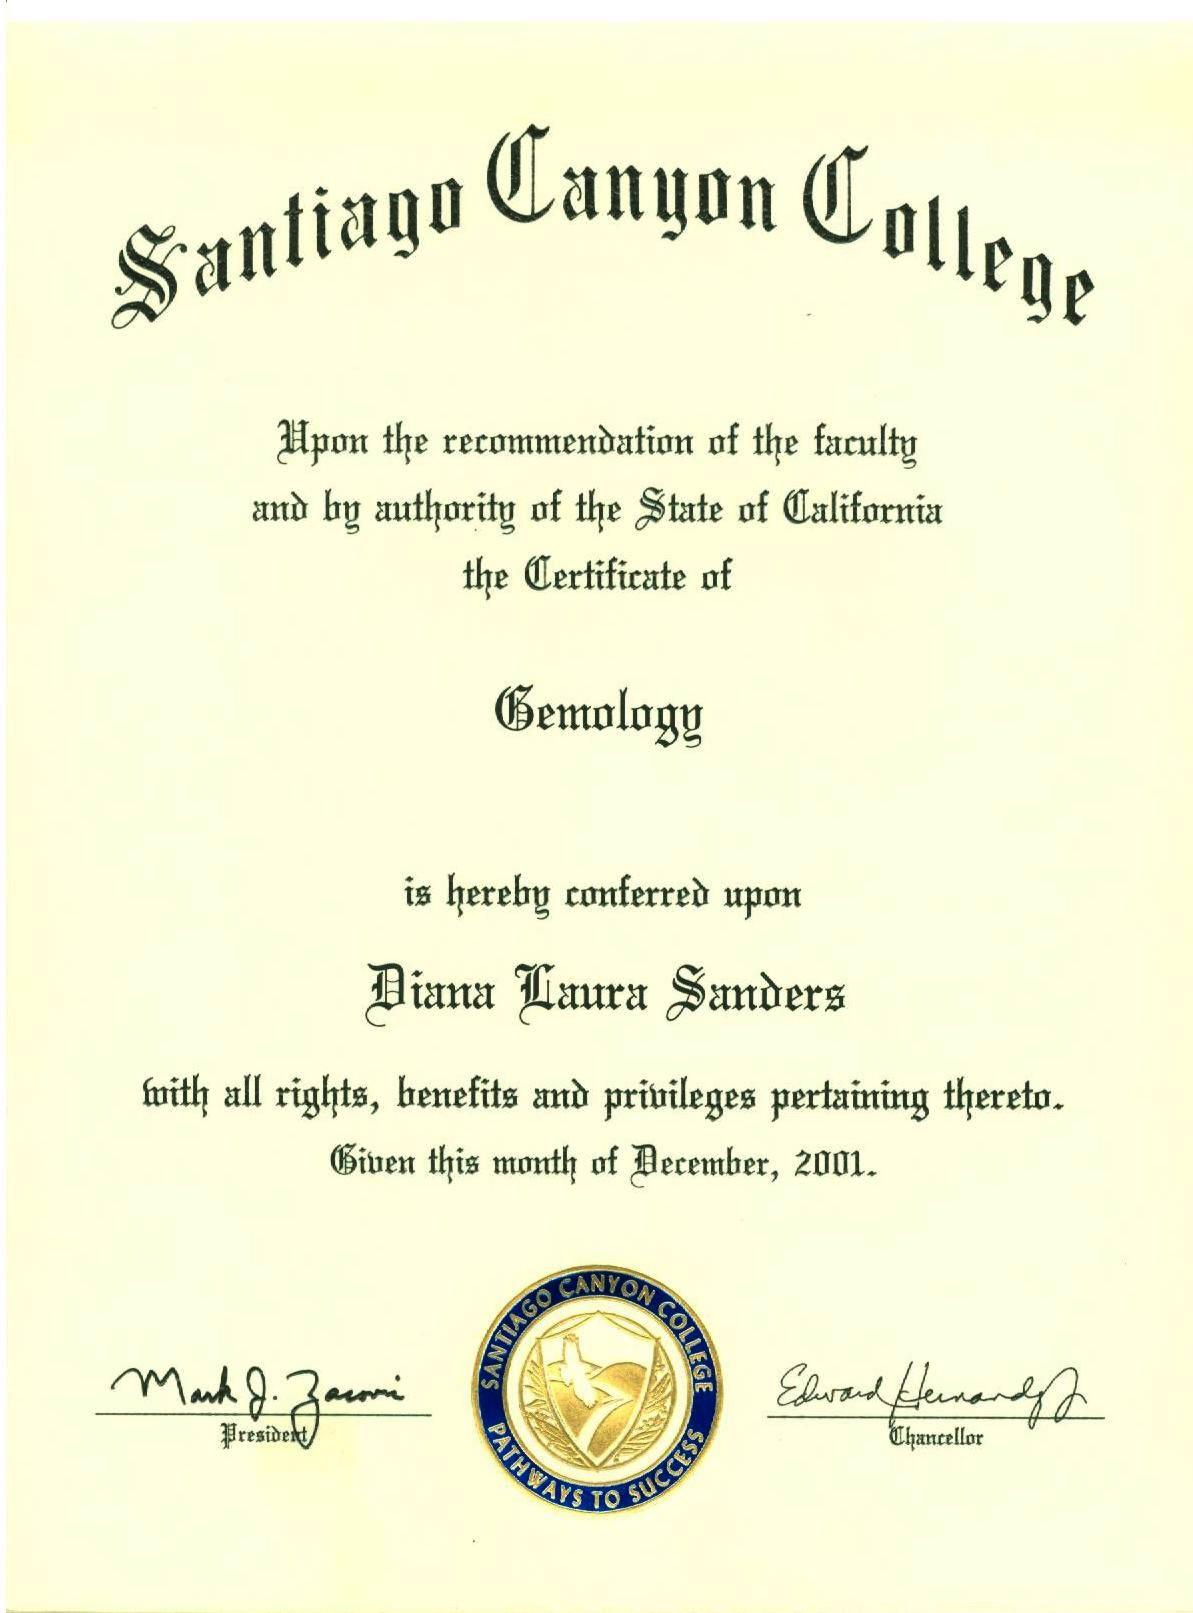 Santiago Canyon College gemology certificate